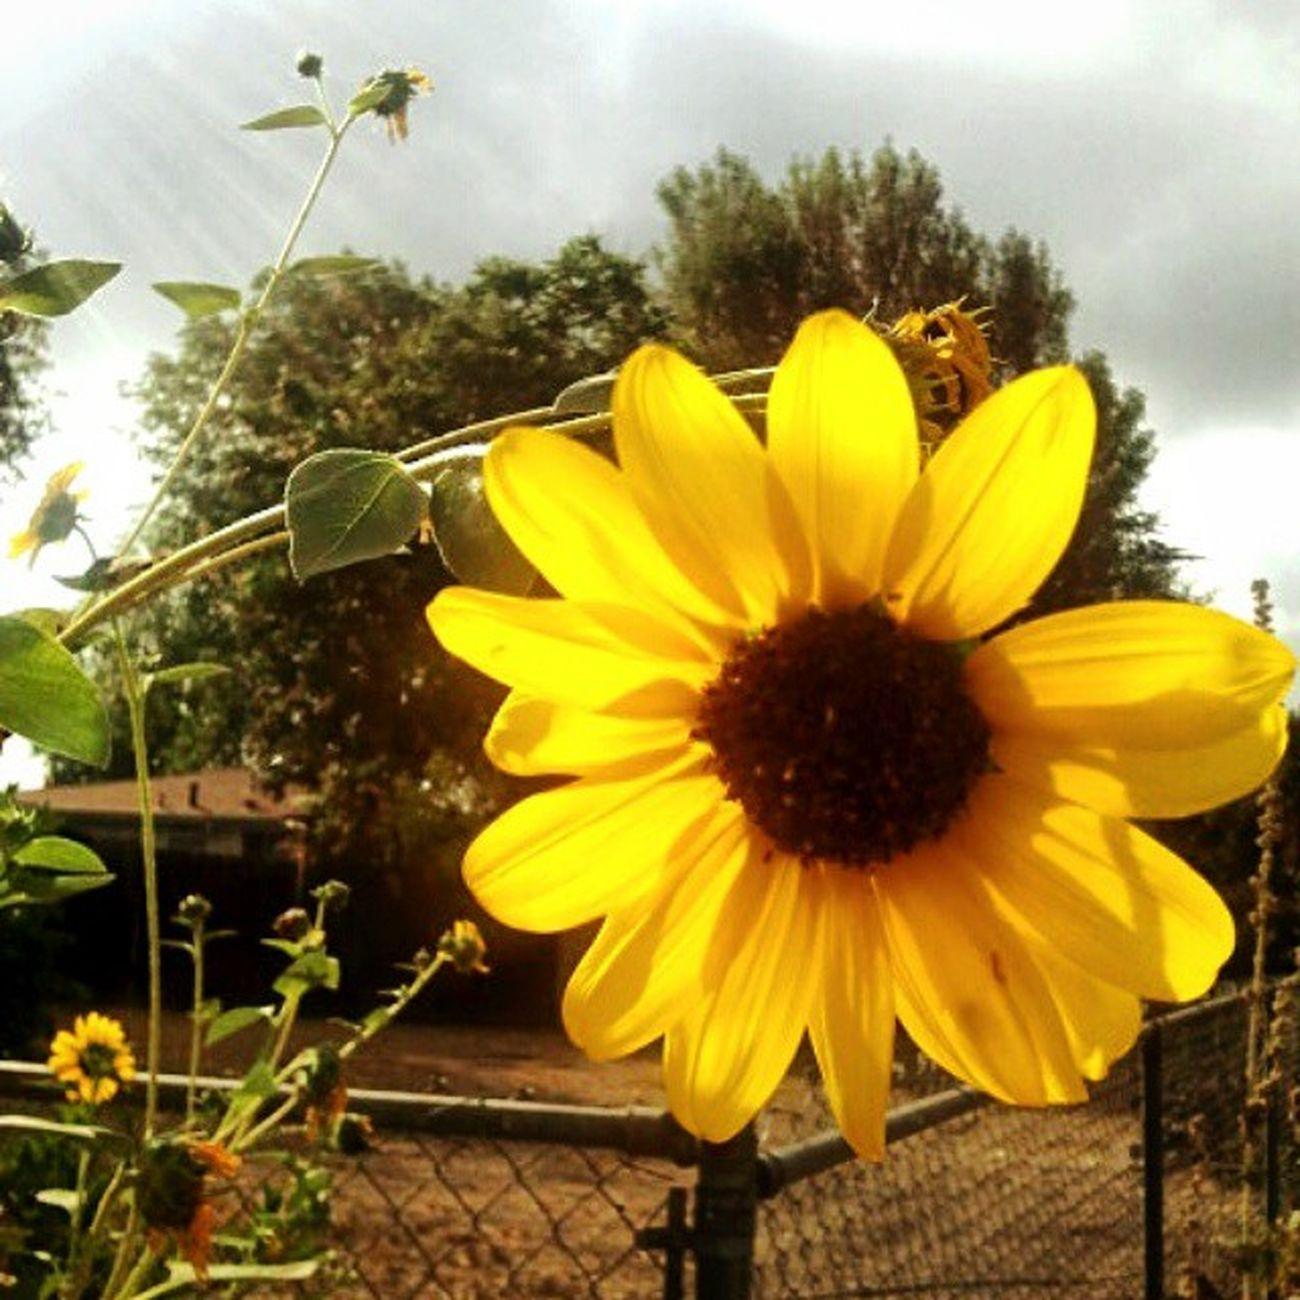 🌻 power ❤ Sunflowers Alohafriday Flashbackfriday Favoriteflower